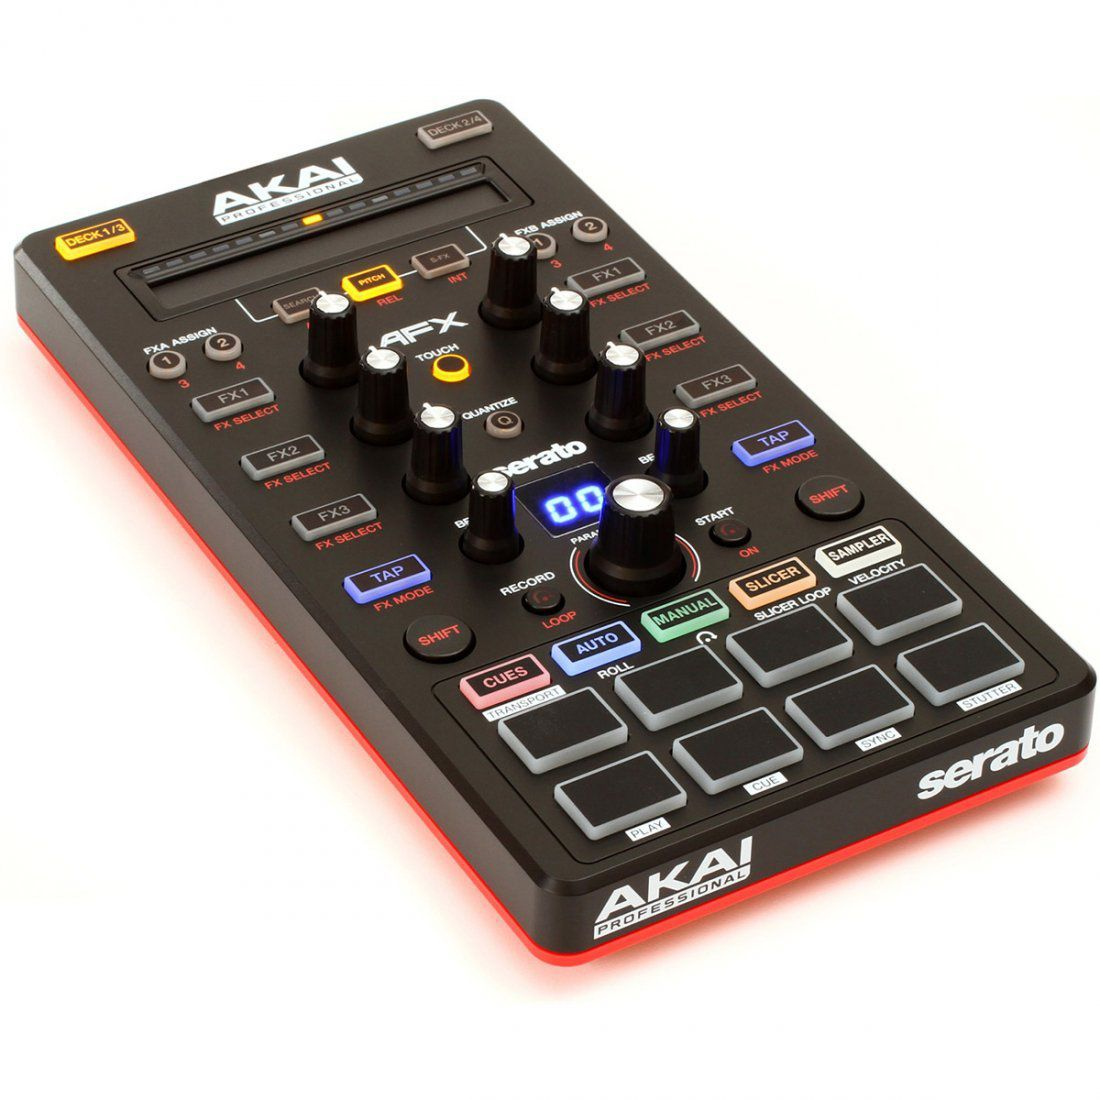 Akai AFX Controladora Dj 4-Decks 8-Pads Serato Dj